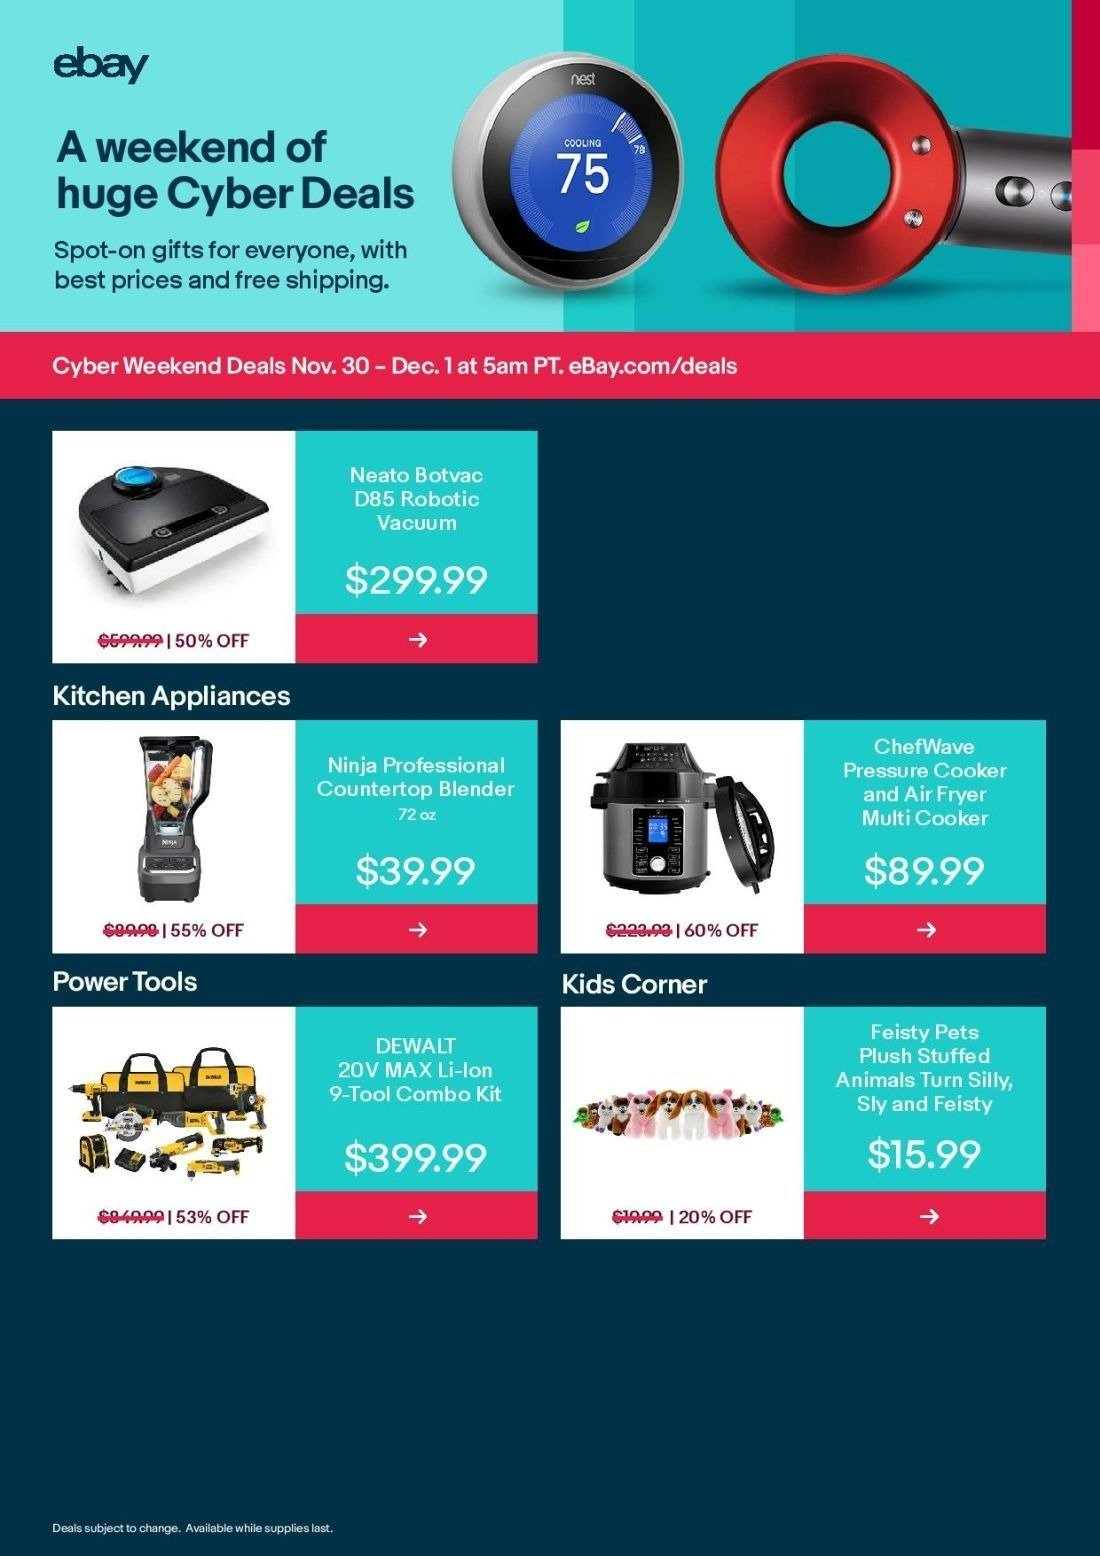 Ebay Cyber Monday 2019 Page 2